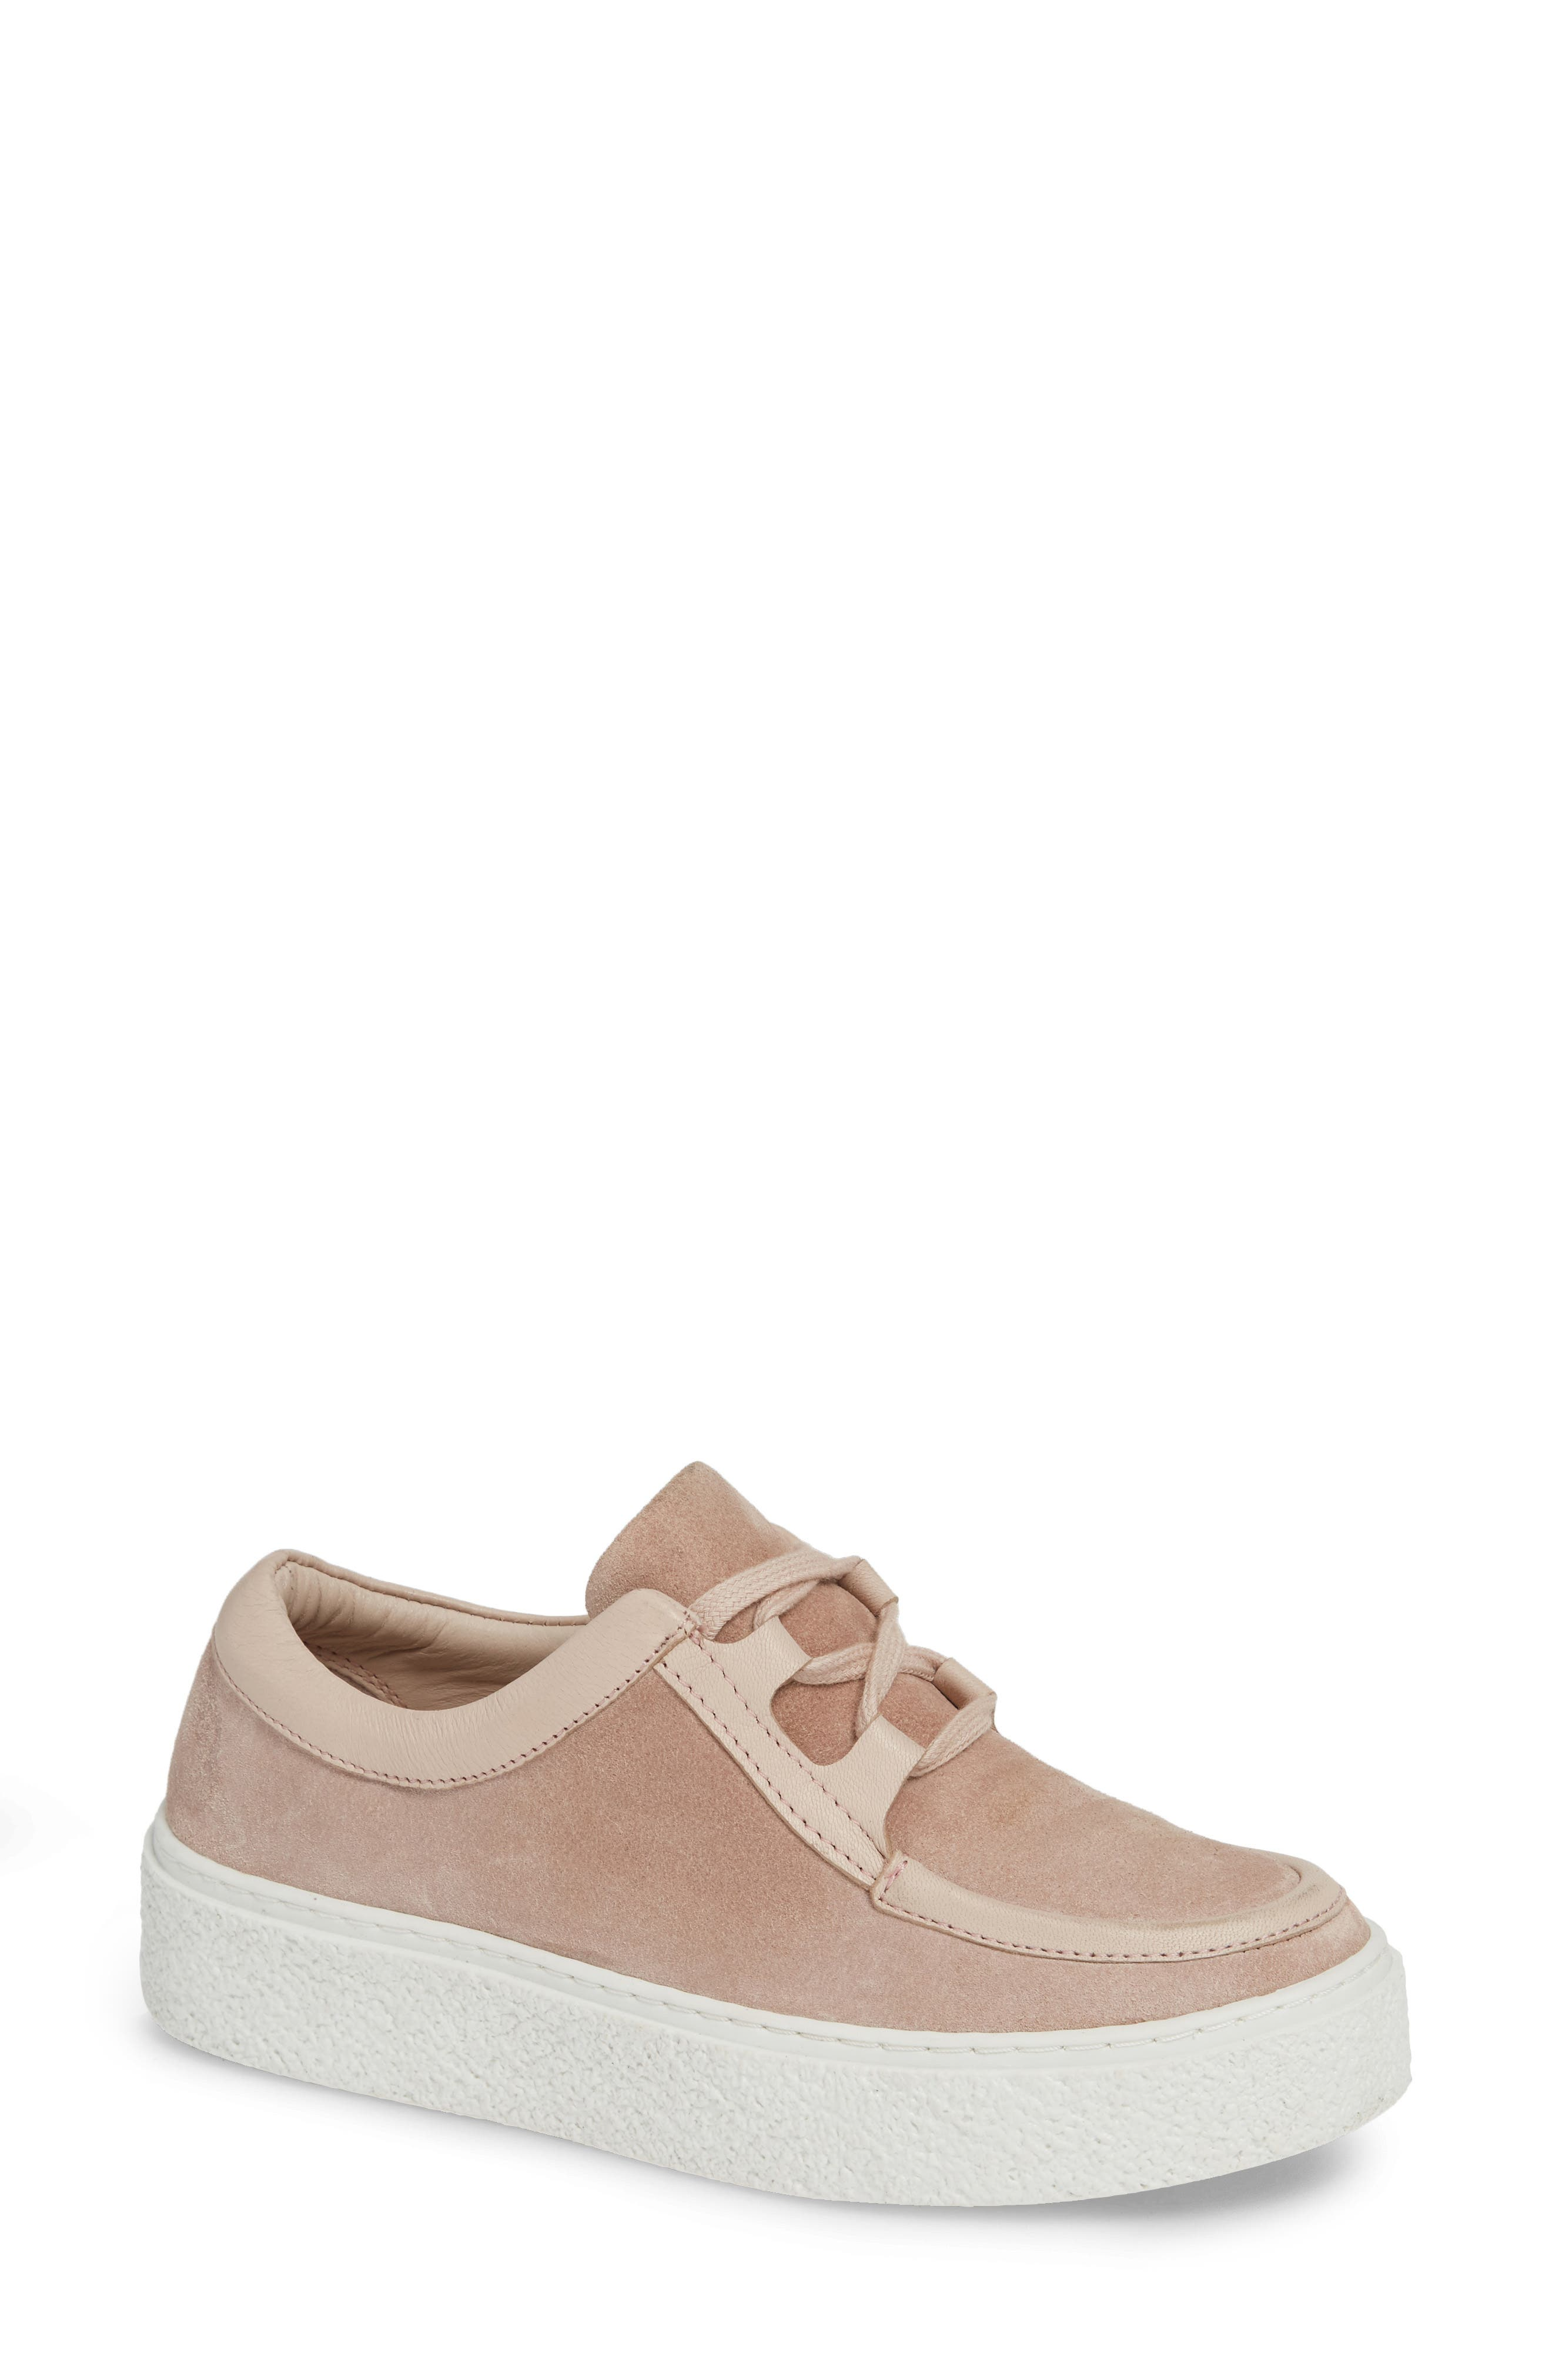 Seychelles Cultivate Sneaker, Pink